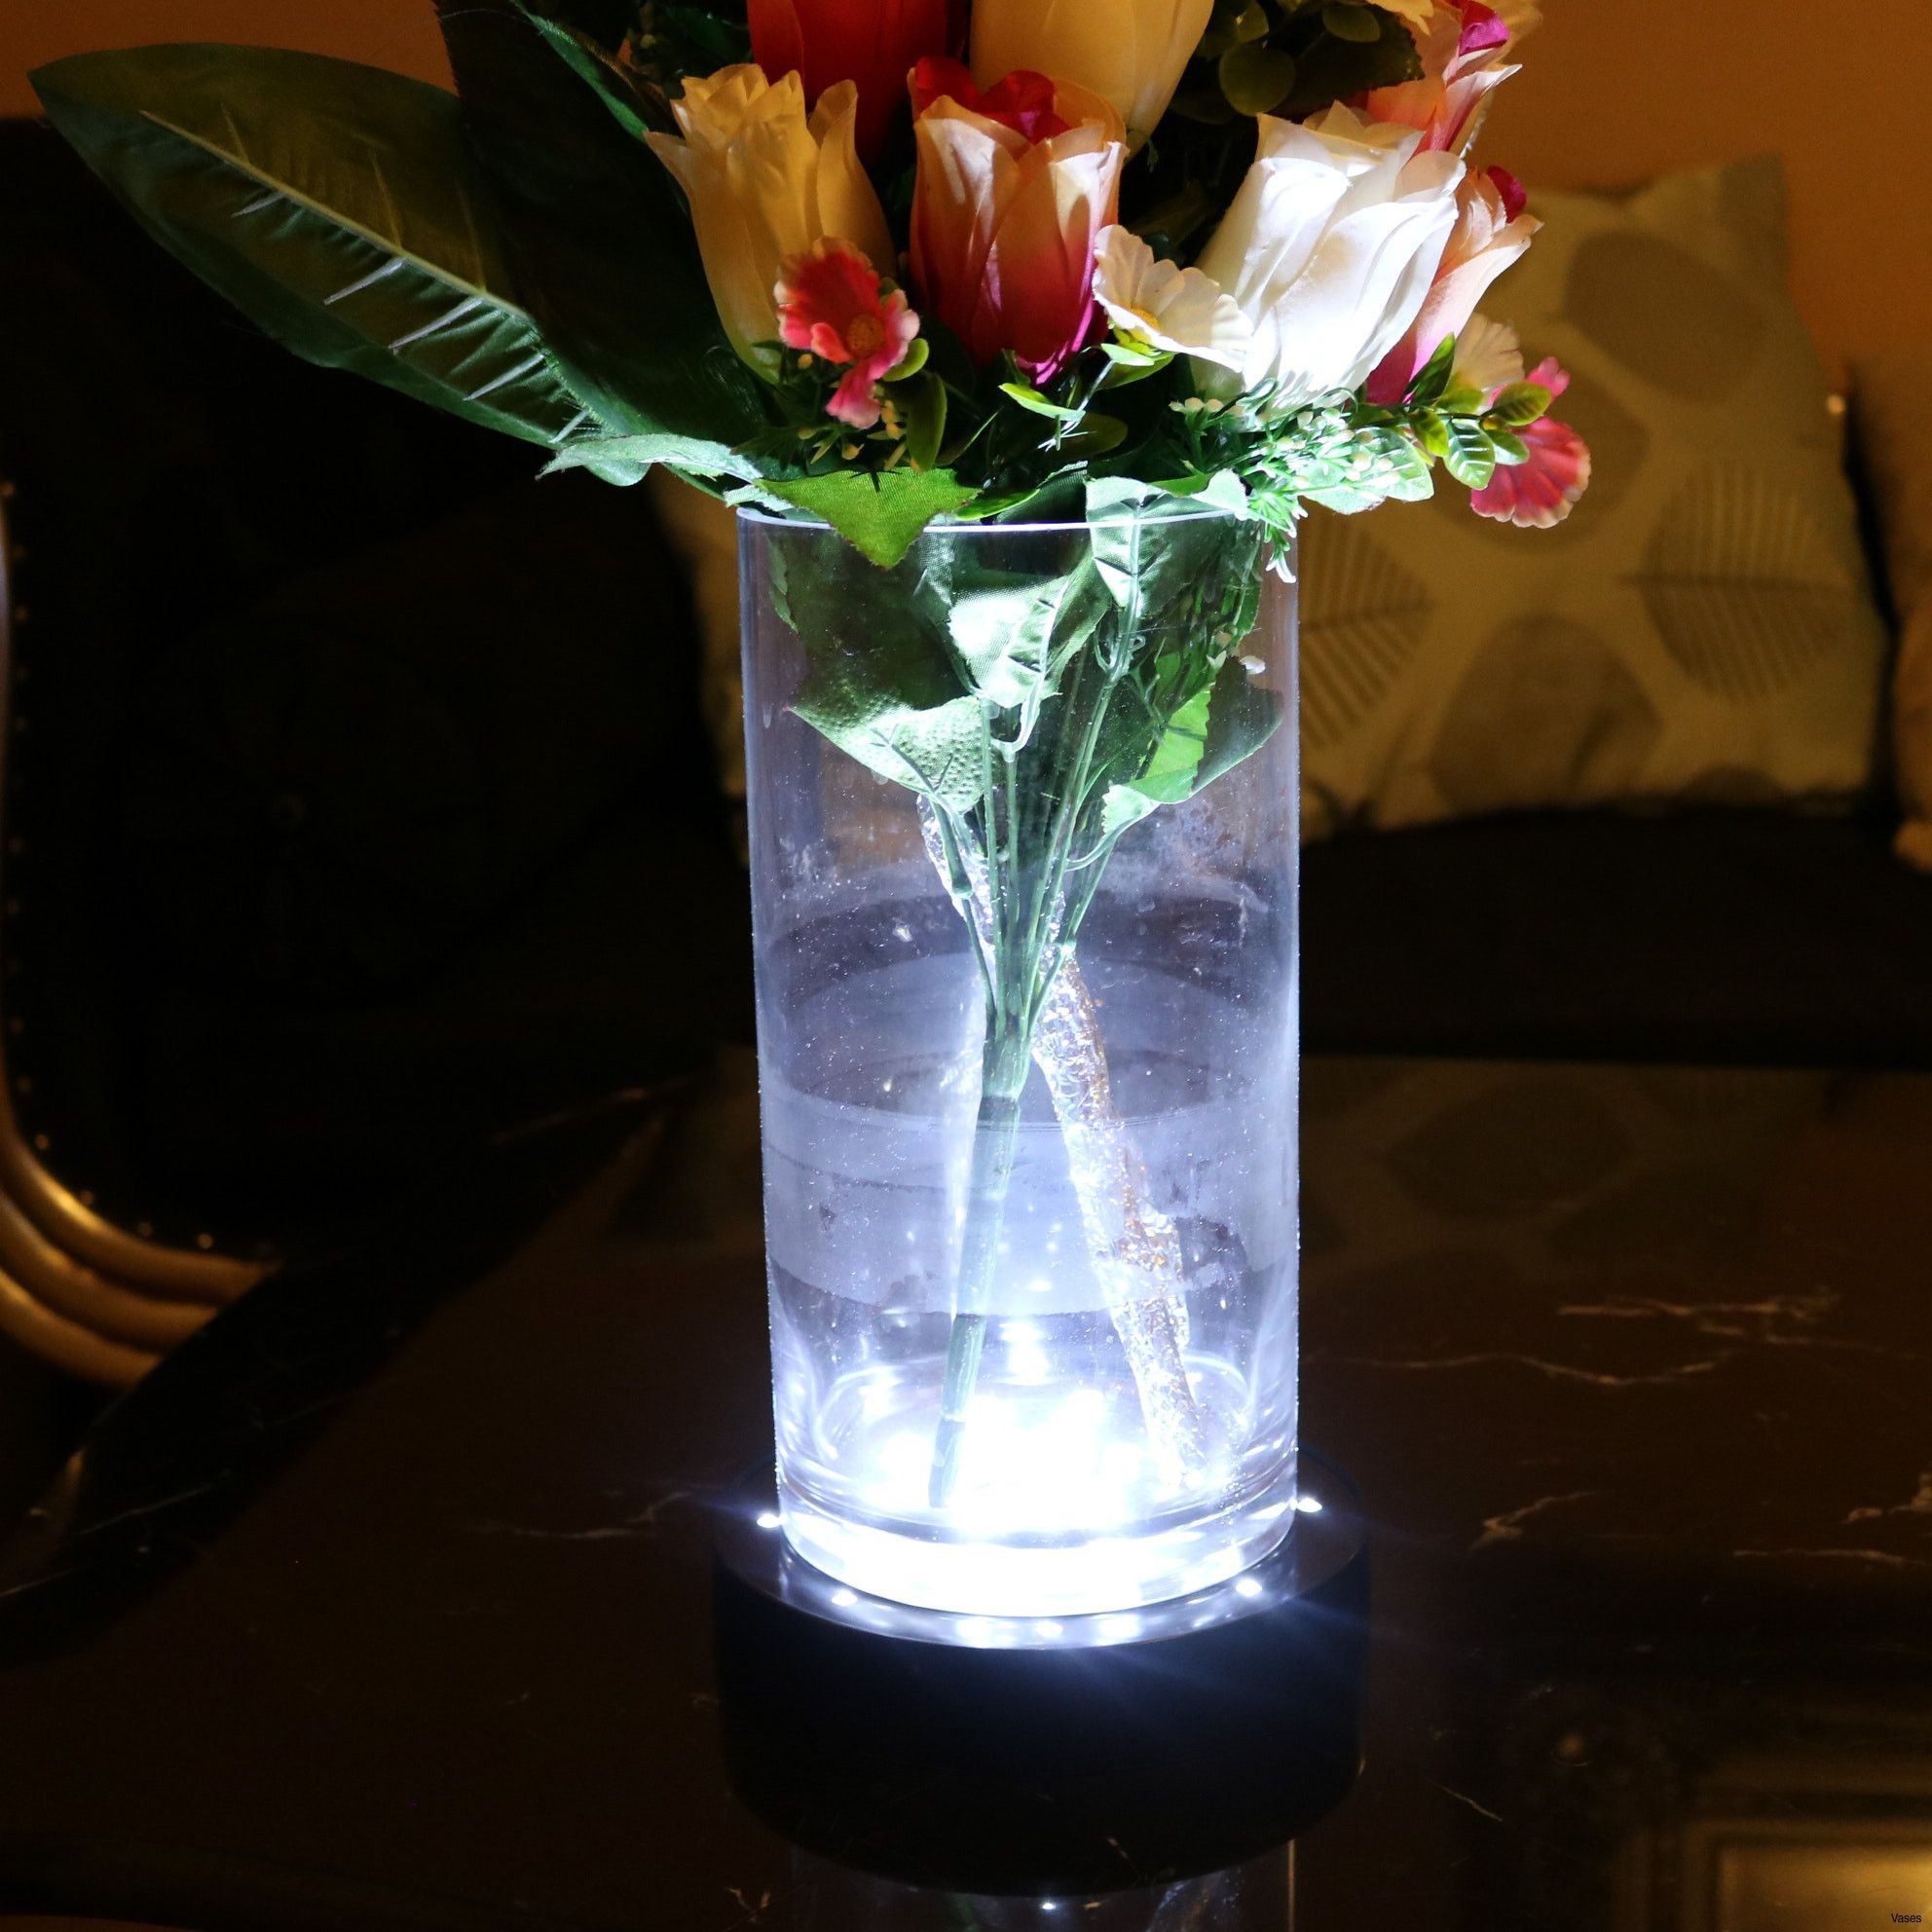 Glass Display Vase Of Tall Vases wholesale Elegant Hanging Glass Vase Diy Flower Vases within Tall Vases wholesale Elegant Hanging Glass Vase Diy Flower Vases Design